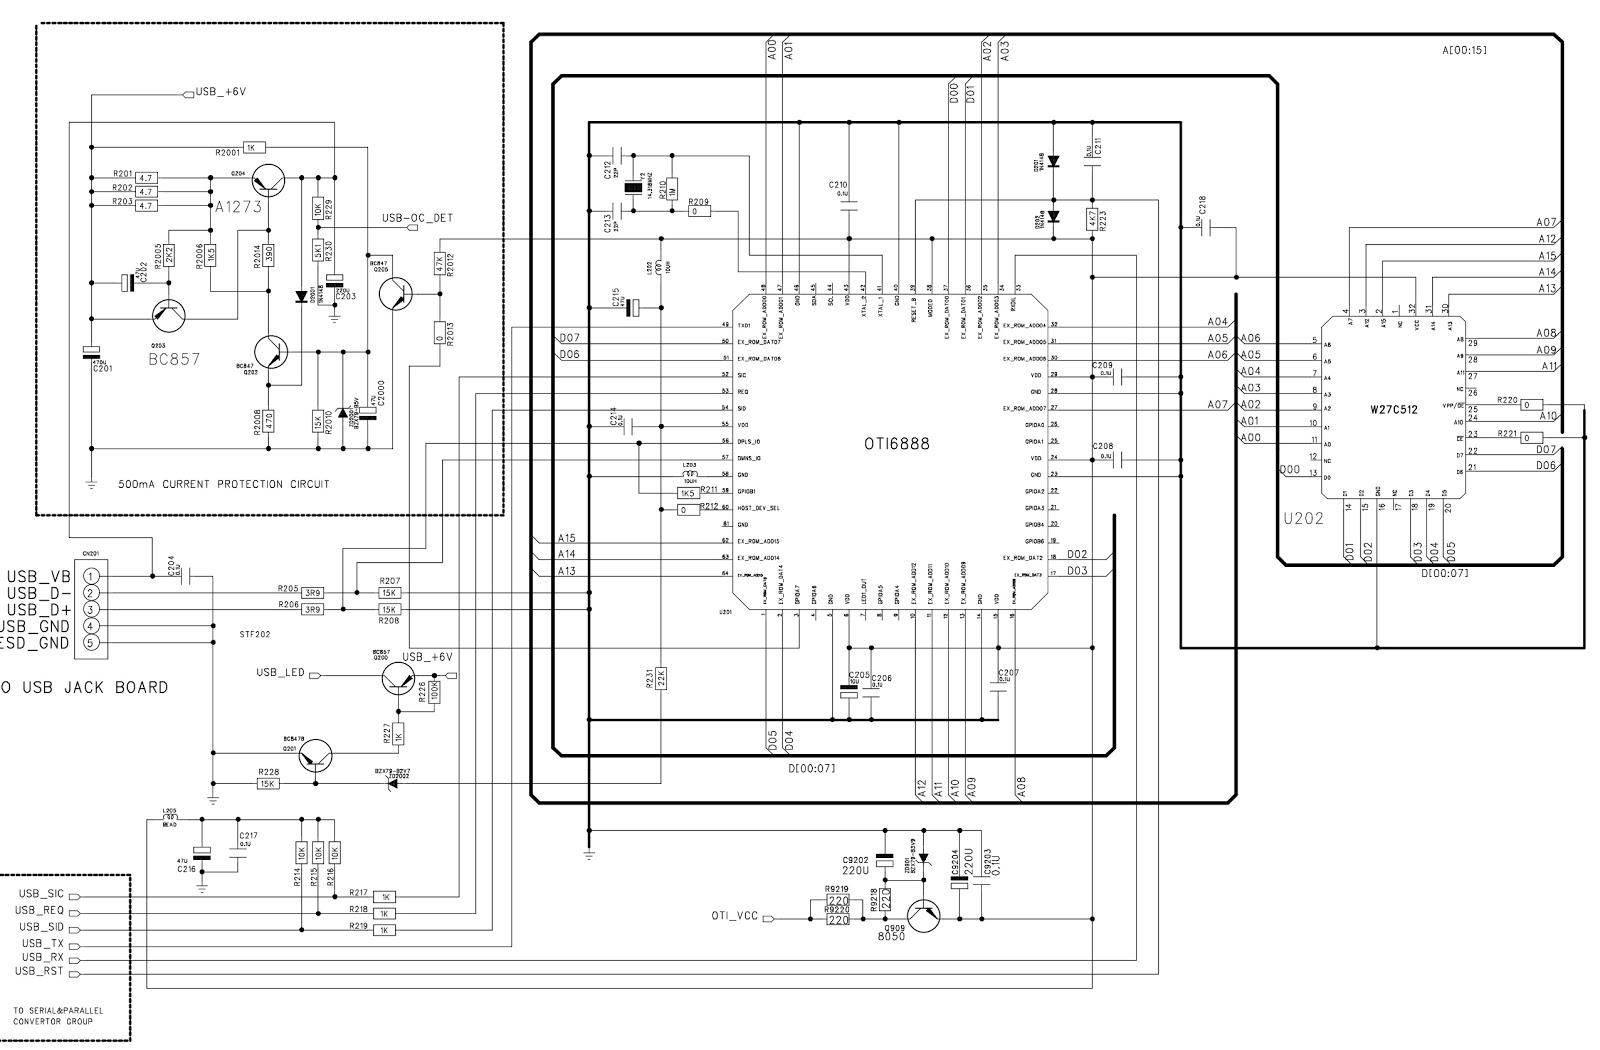 philips mcm726 mp3 micro hi-fi system